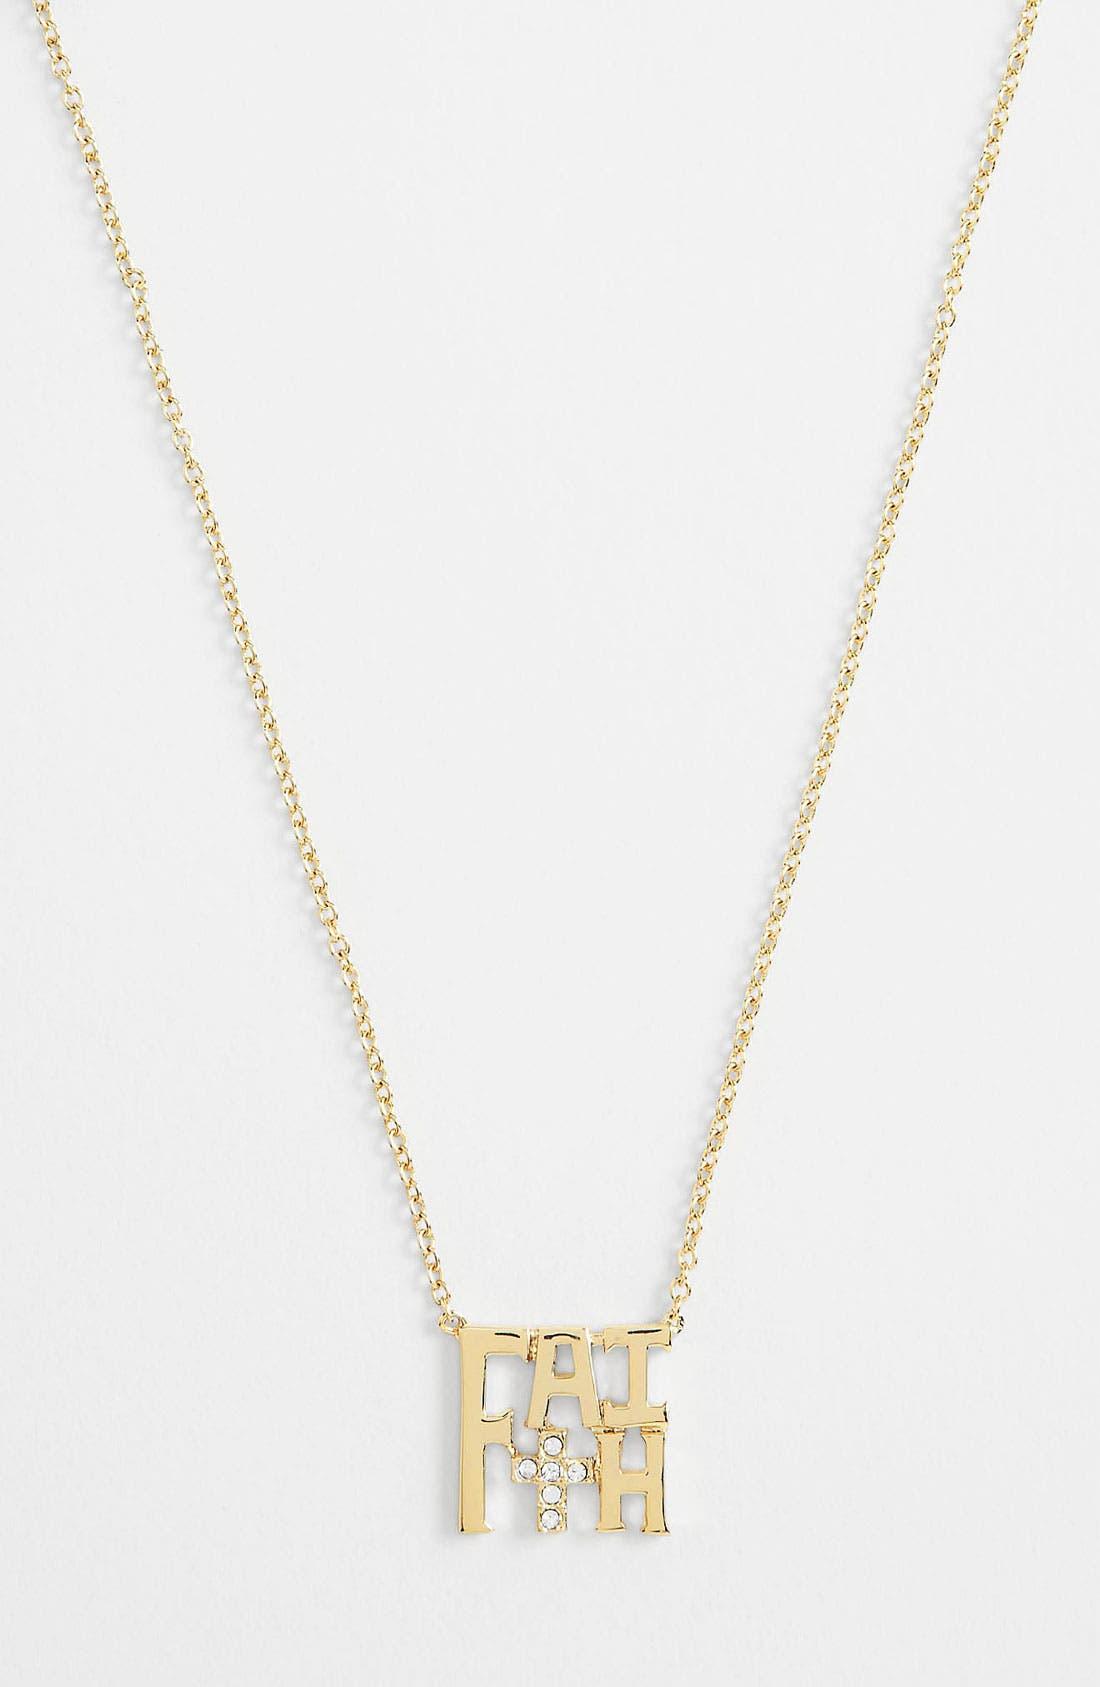 Main Image - Ariella Collection 'Messages - Faith' Pendant Necklace